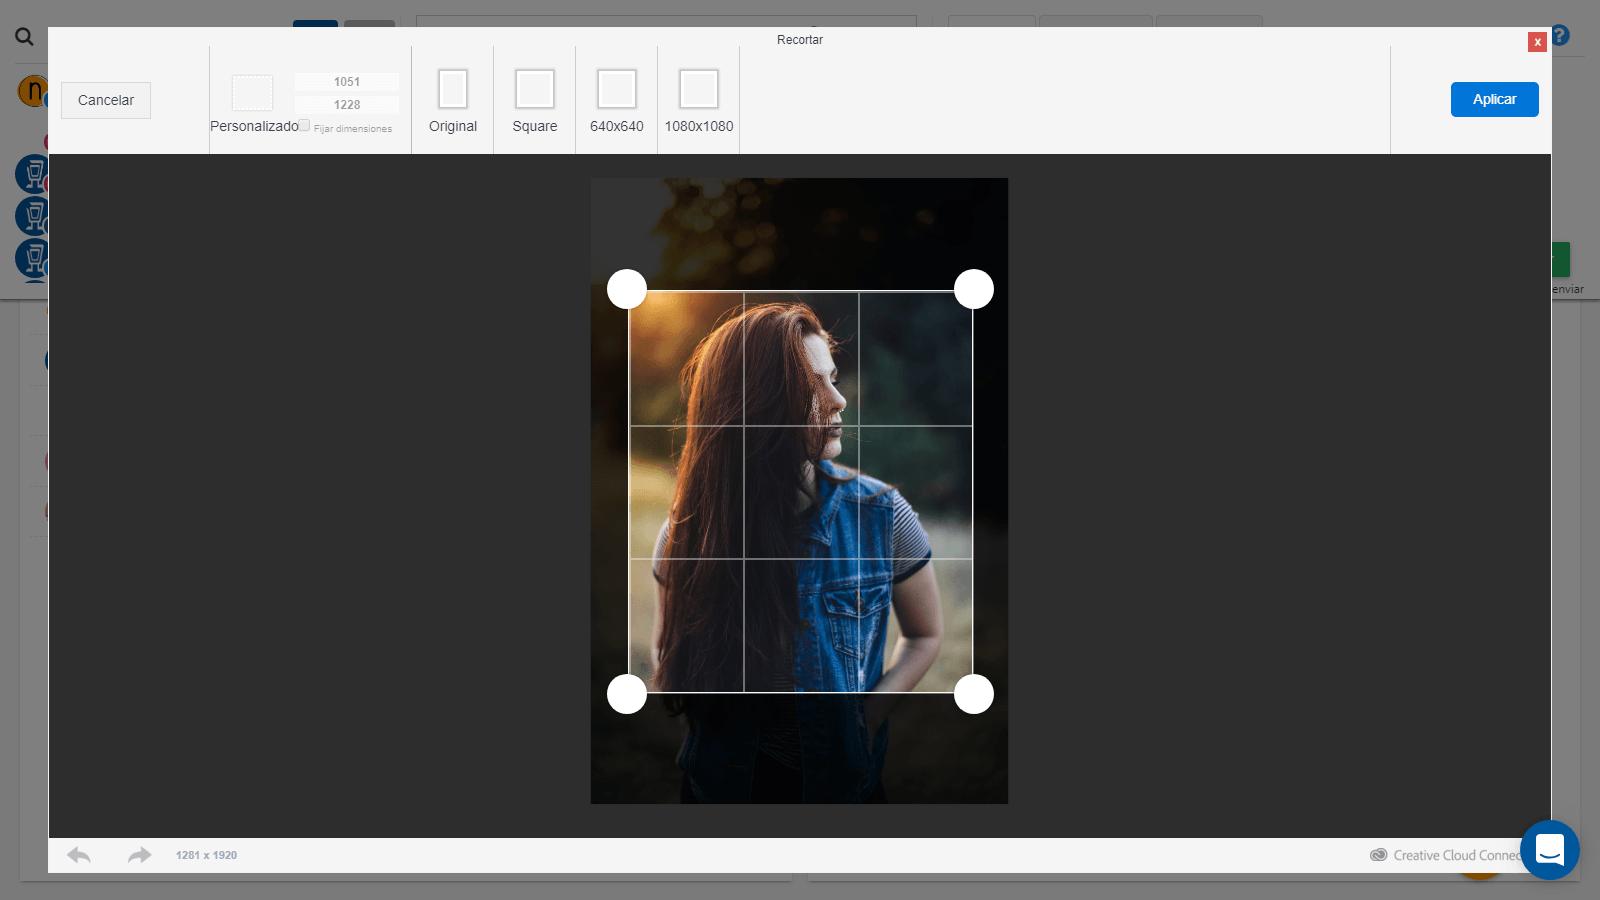 Recortar imagenes con socialgest